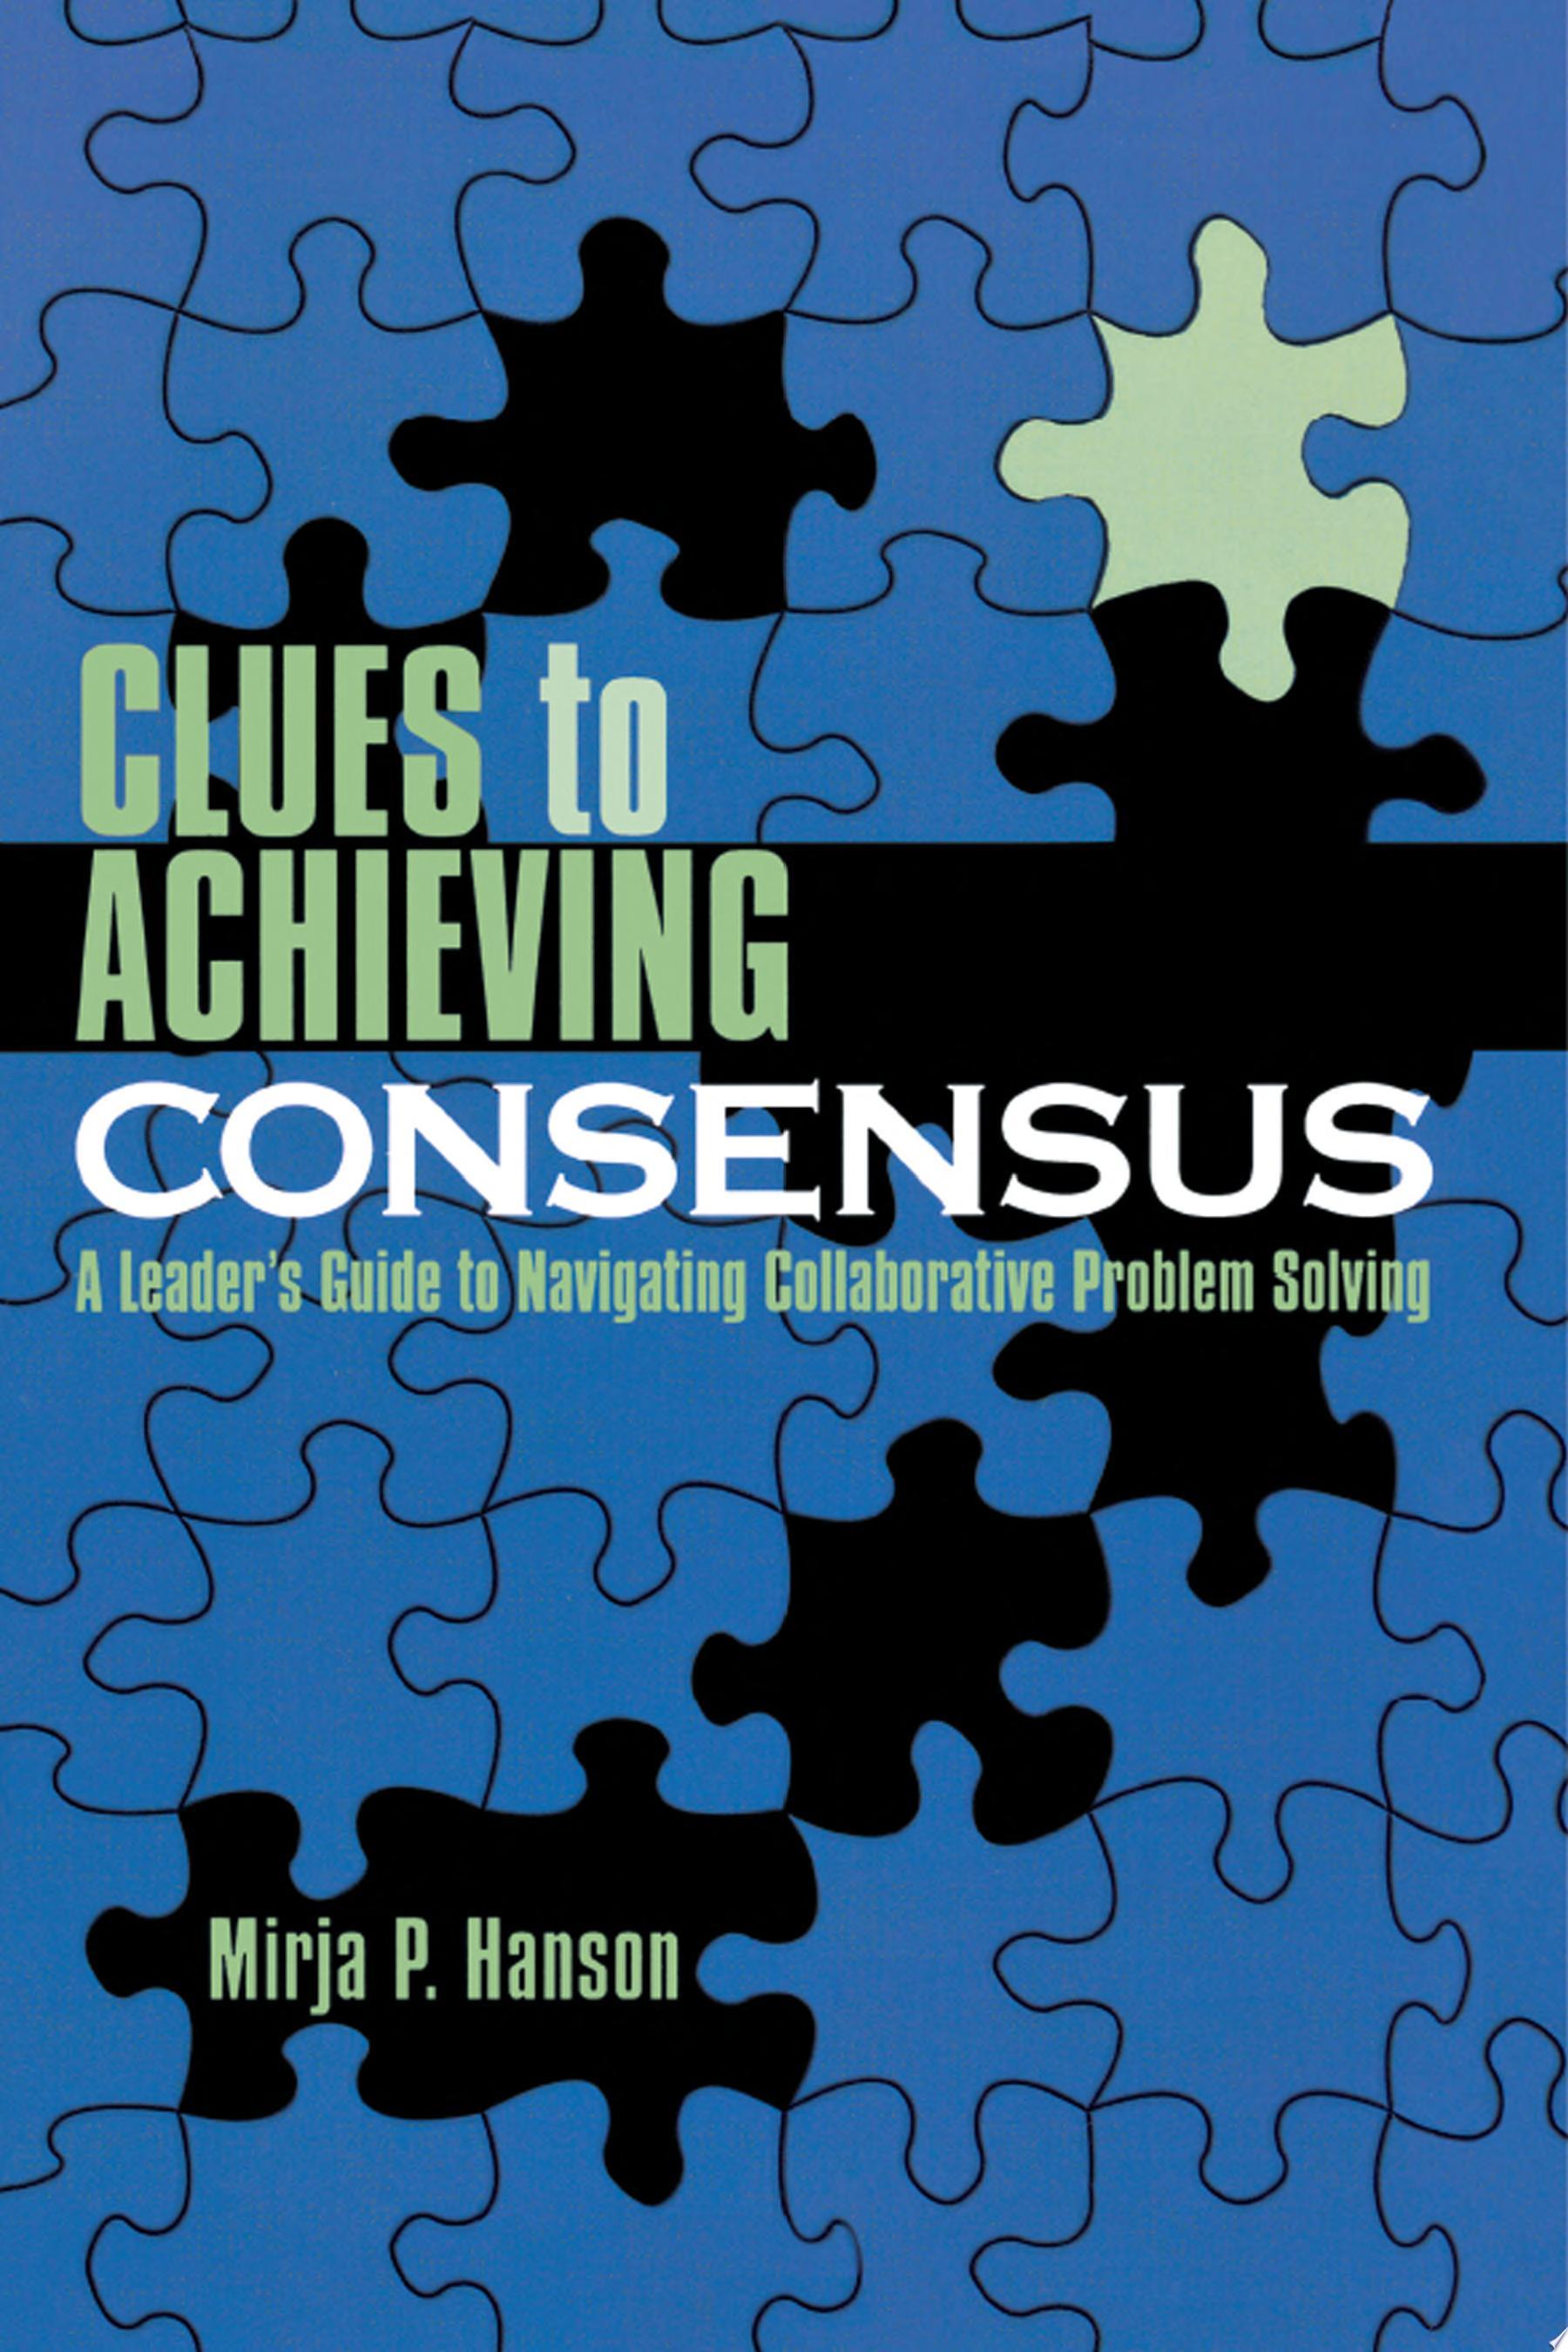 Clues to Achieving Consensus